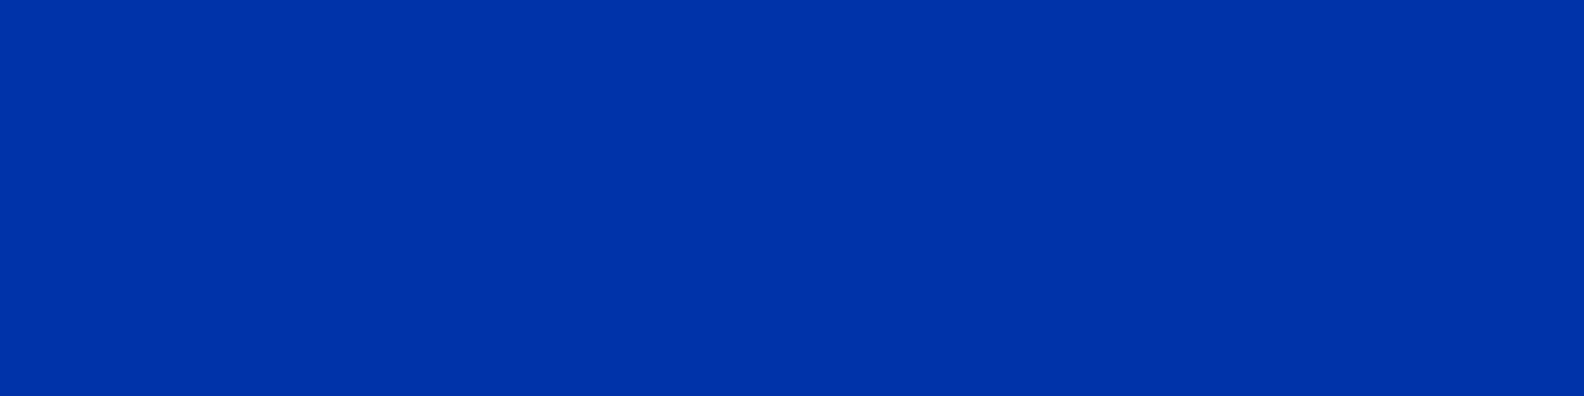 1584x396 UA Blue Solid Color Background